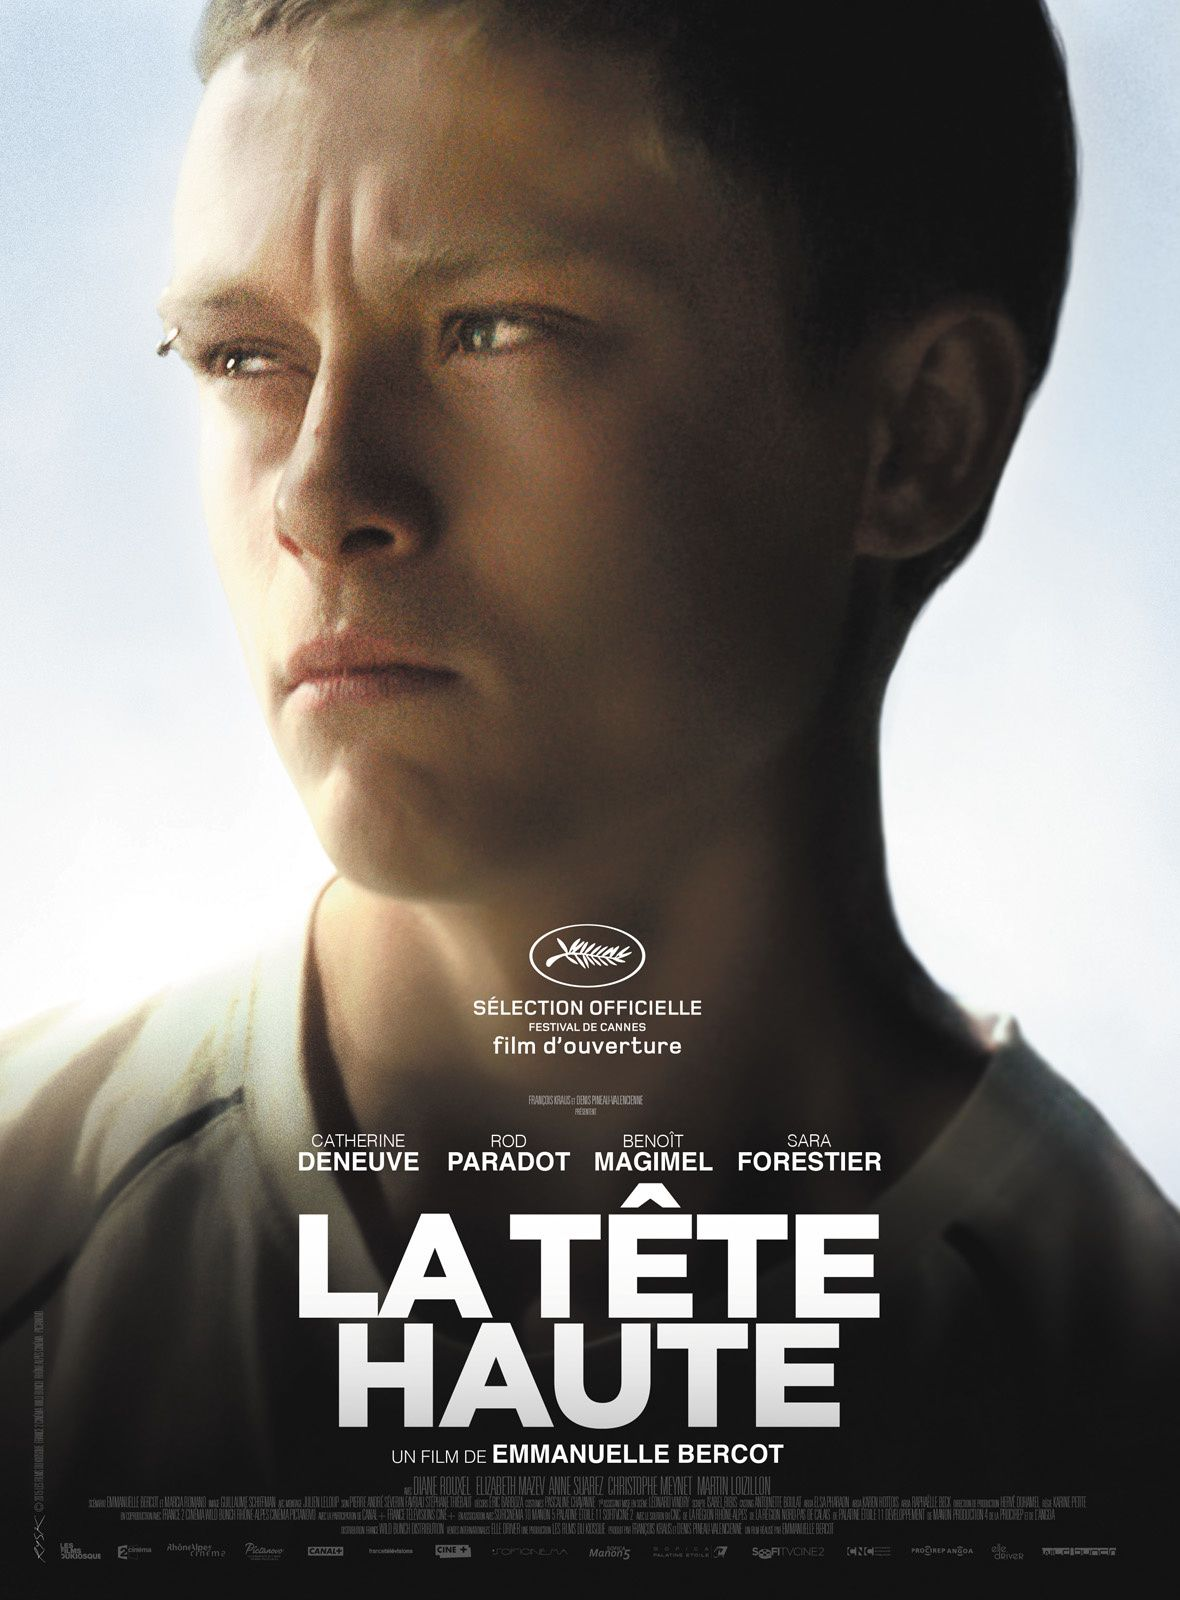 LA TETE HAUTE / CINEMA / EMMANUELLE BERCOT. 2015